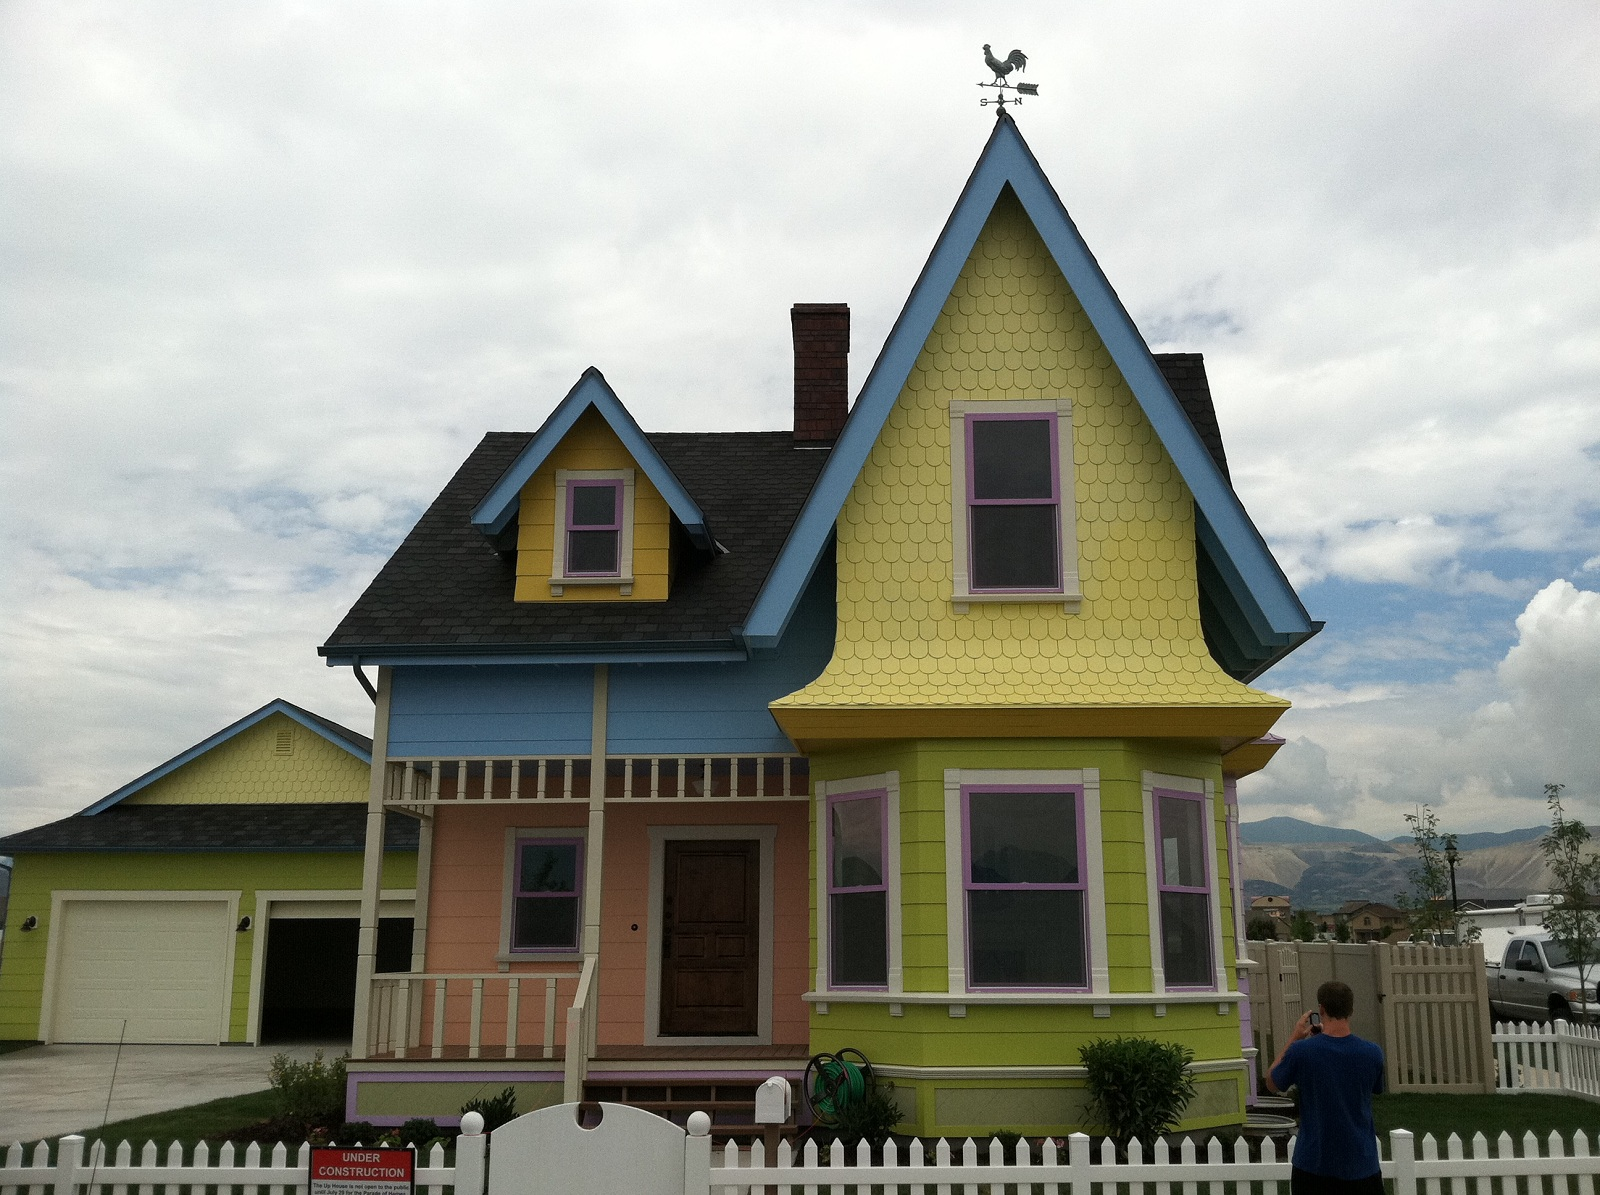 Disney at Heart: UP House